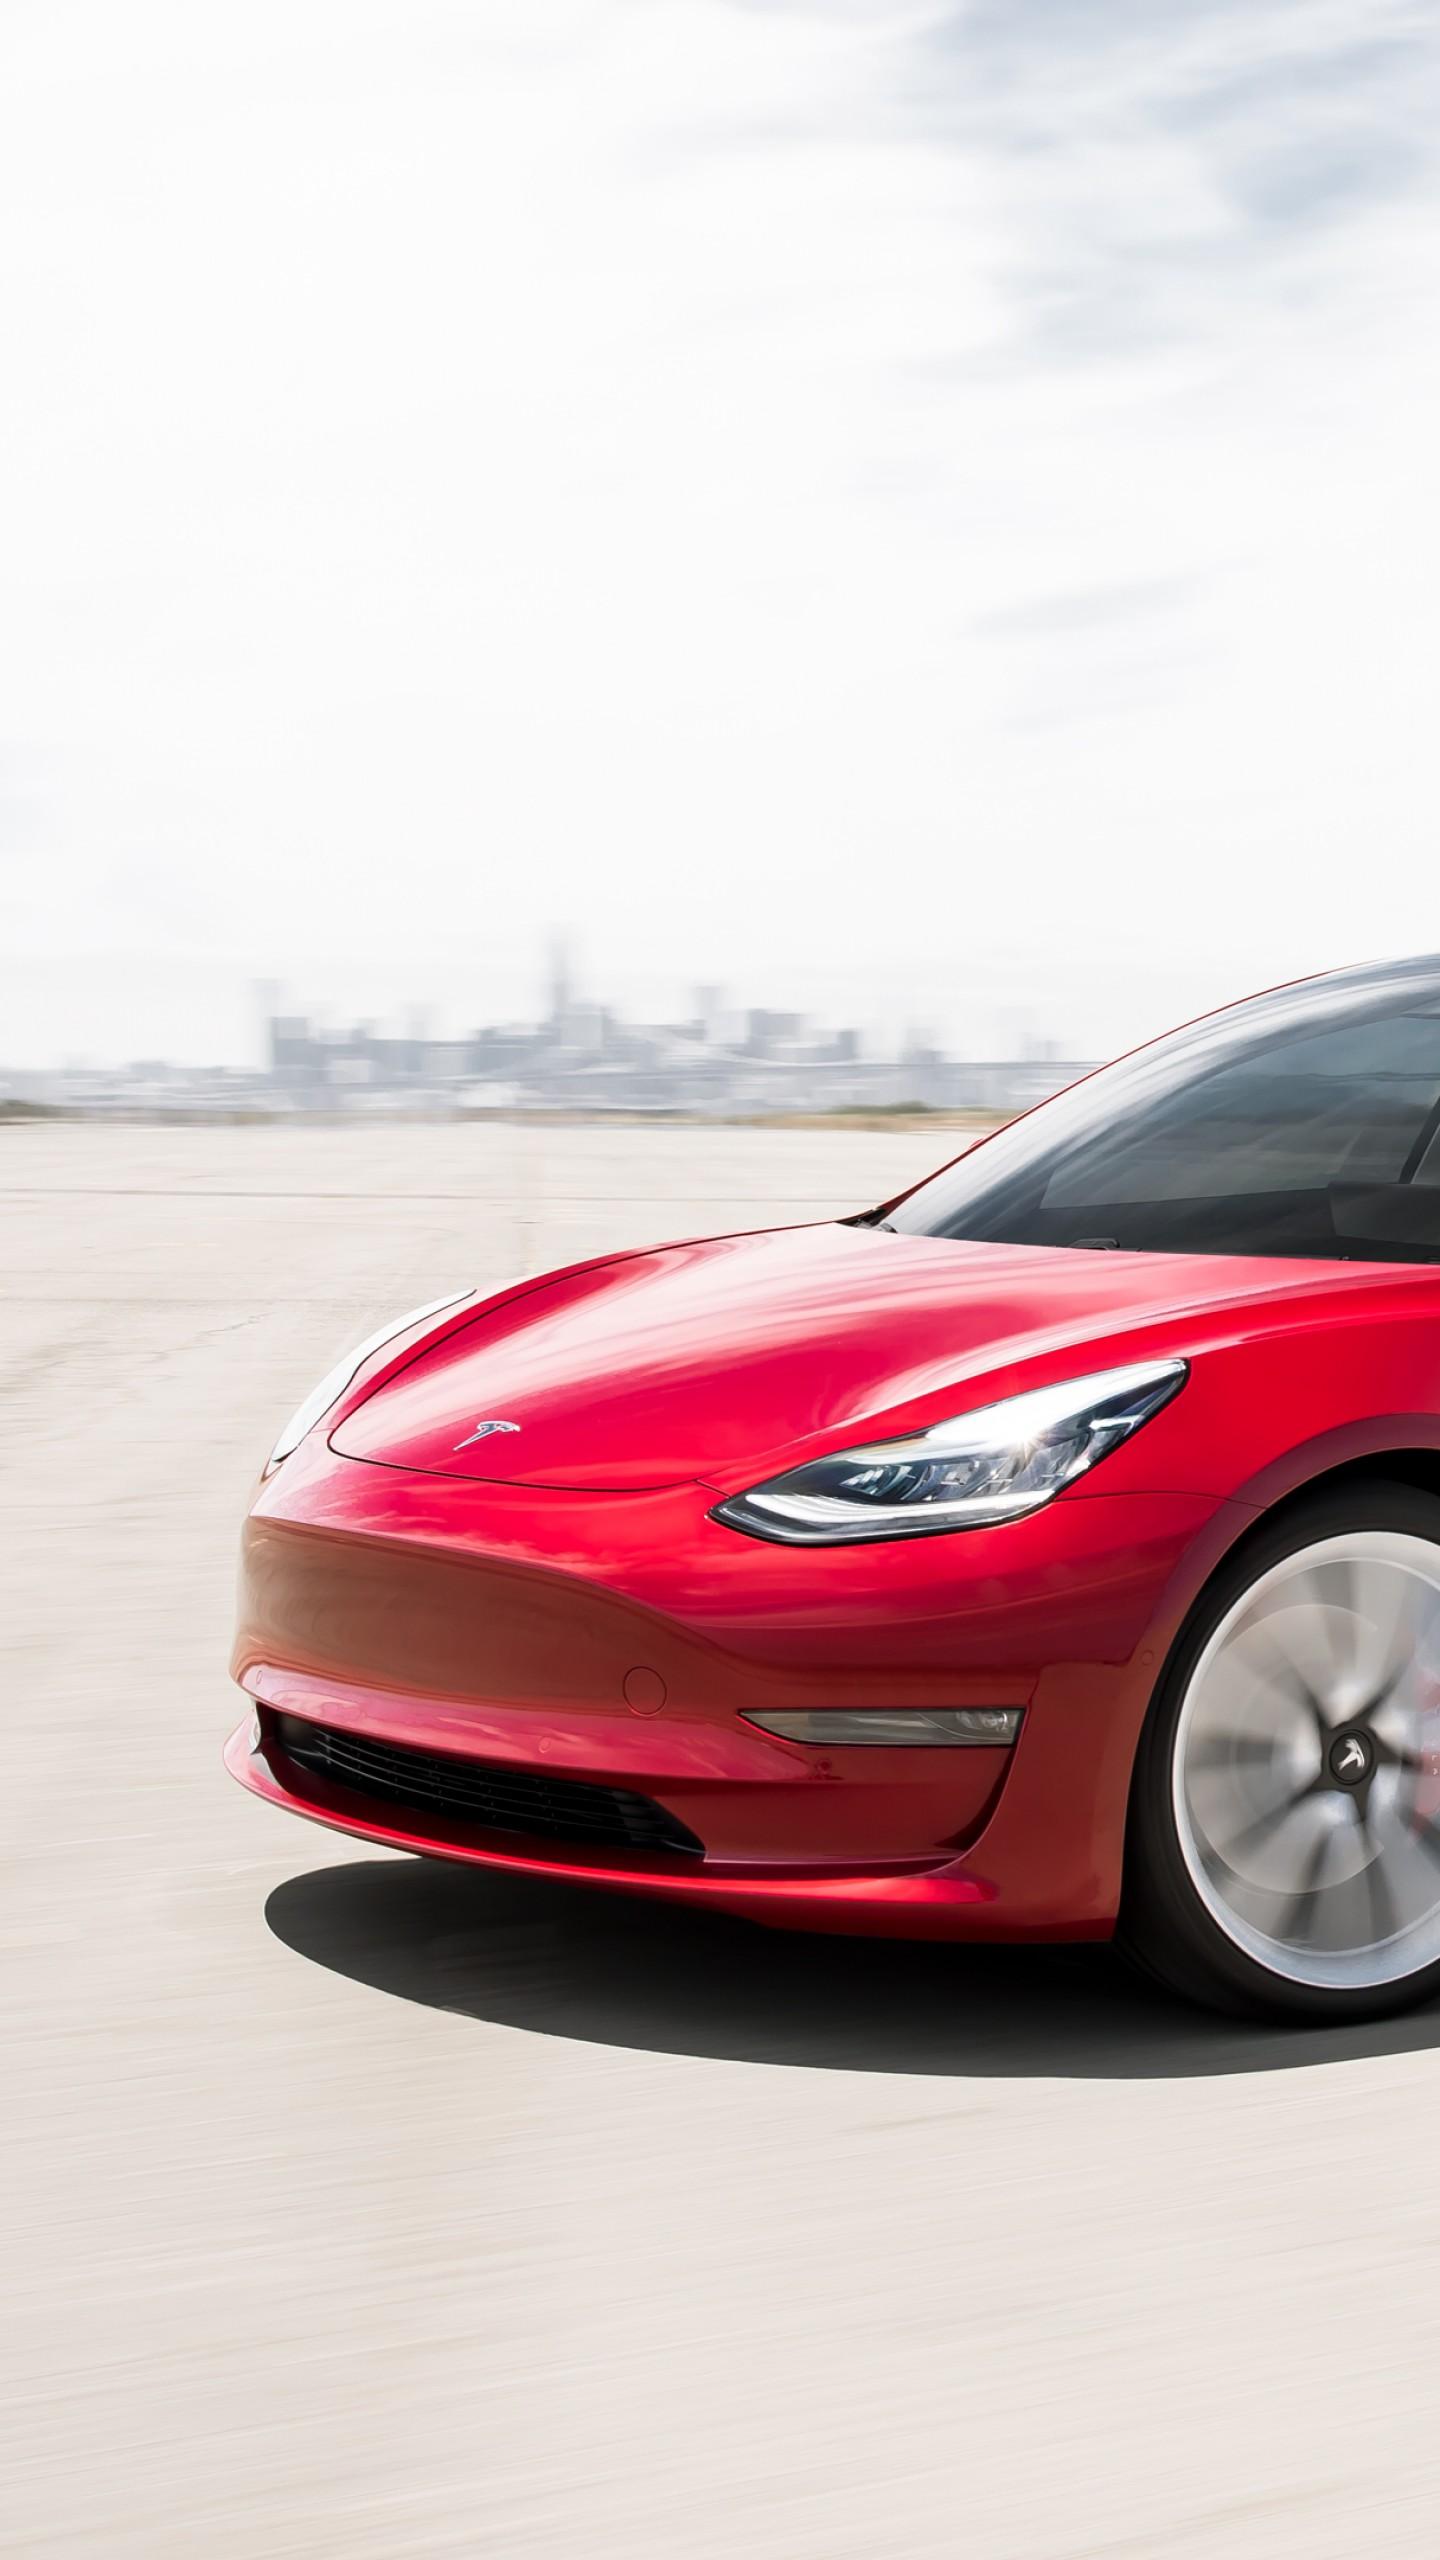 Wallpaper Tesla Model 3 Performance 2019 Cars Electric